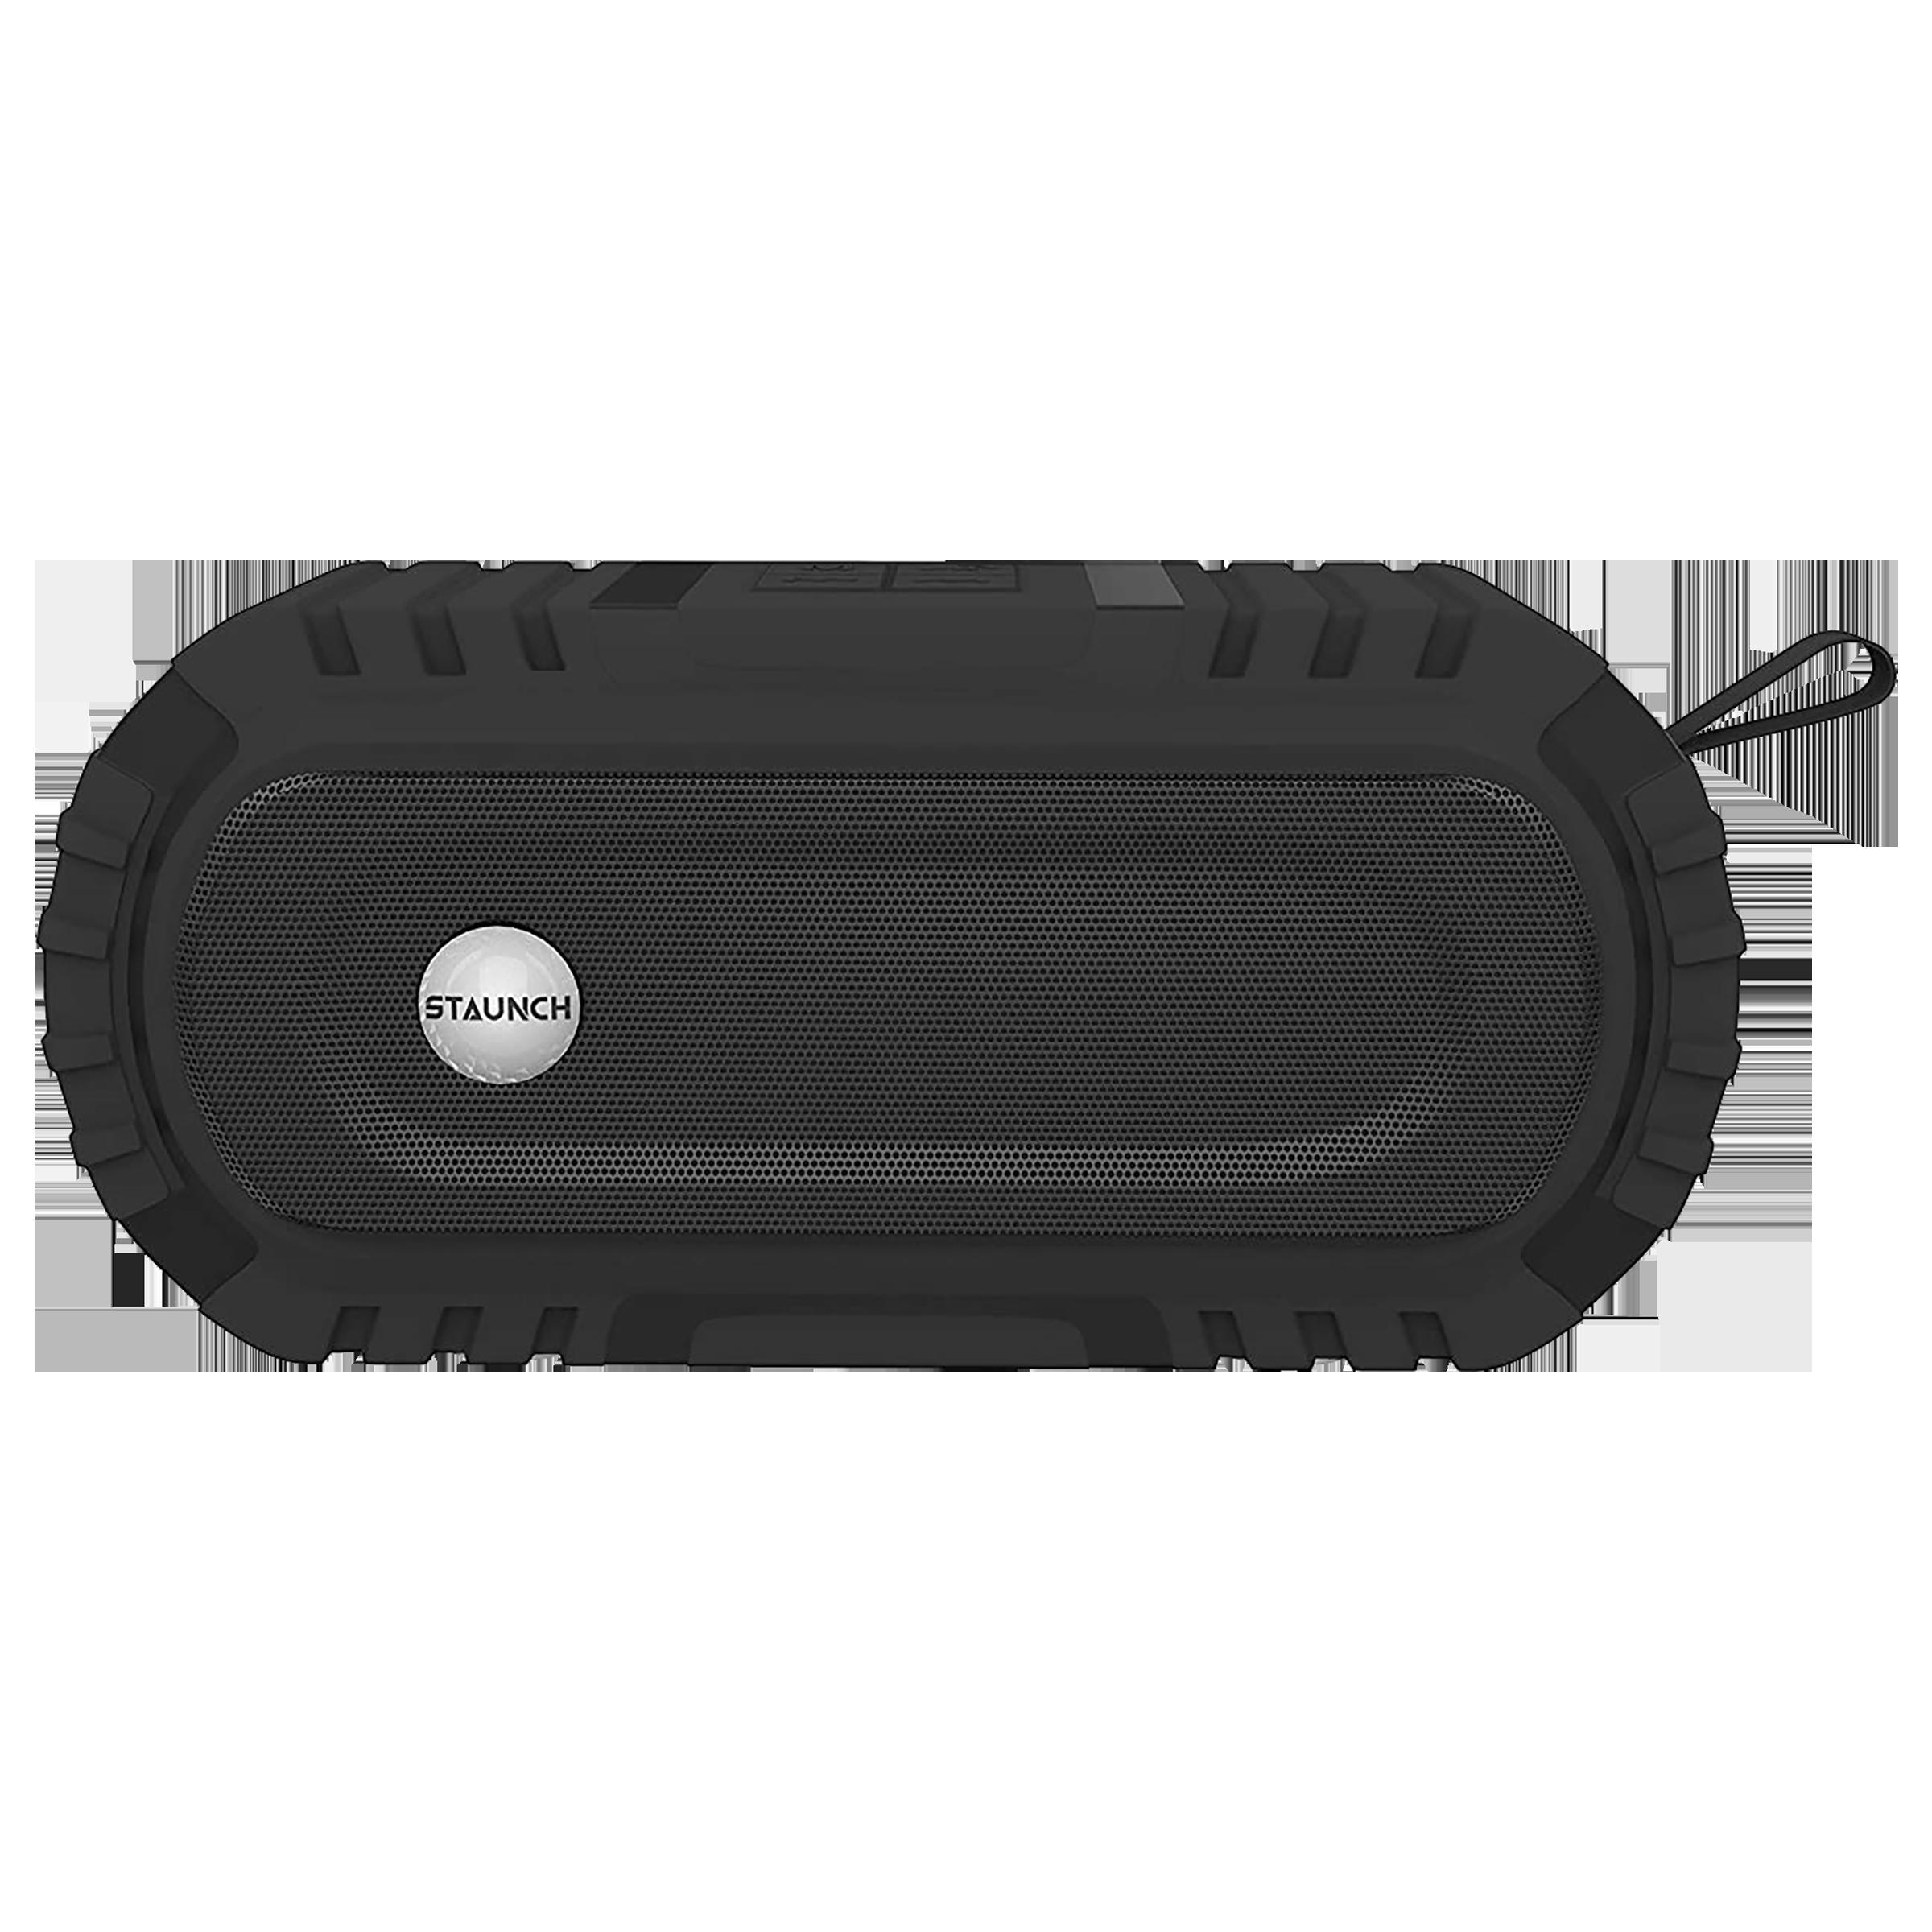 Staunch Thunder 1600 16 Watts Portable Bluetooth Speaker (IPX6-Water Resistant, Black)